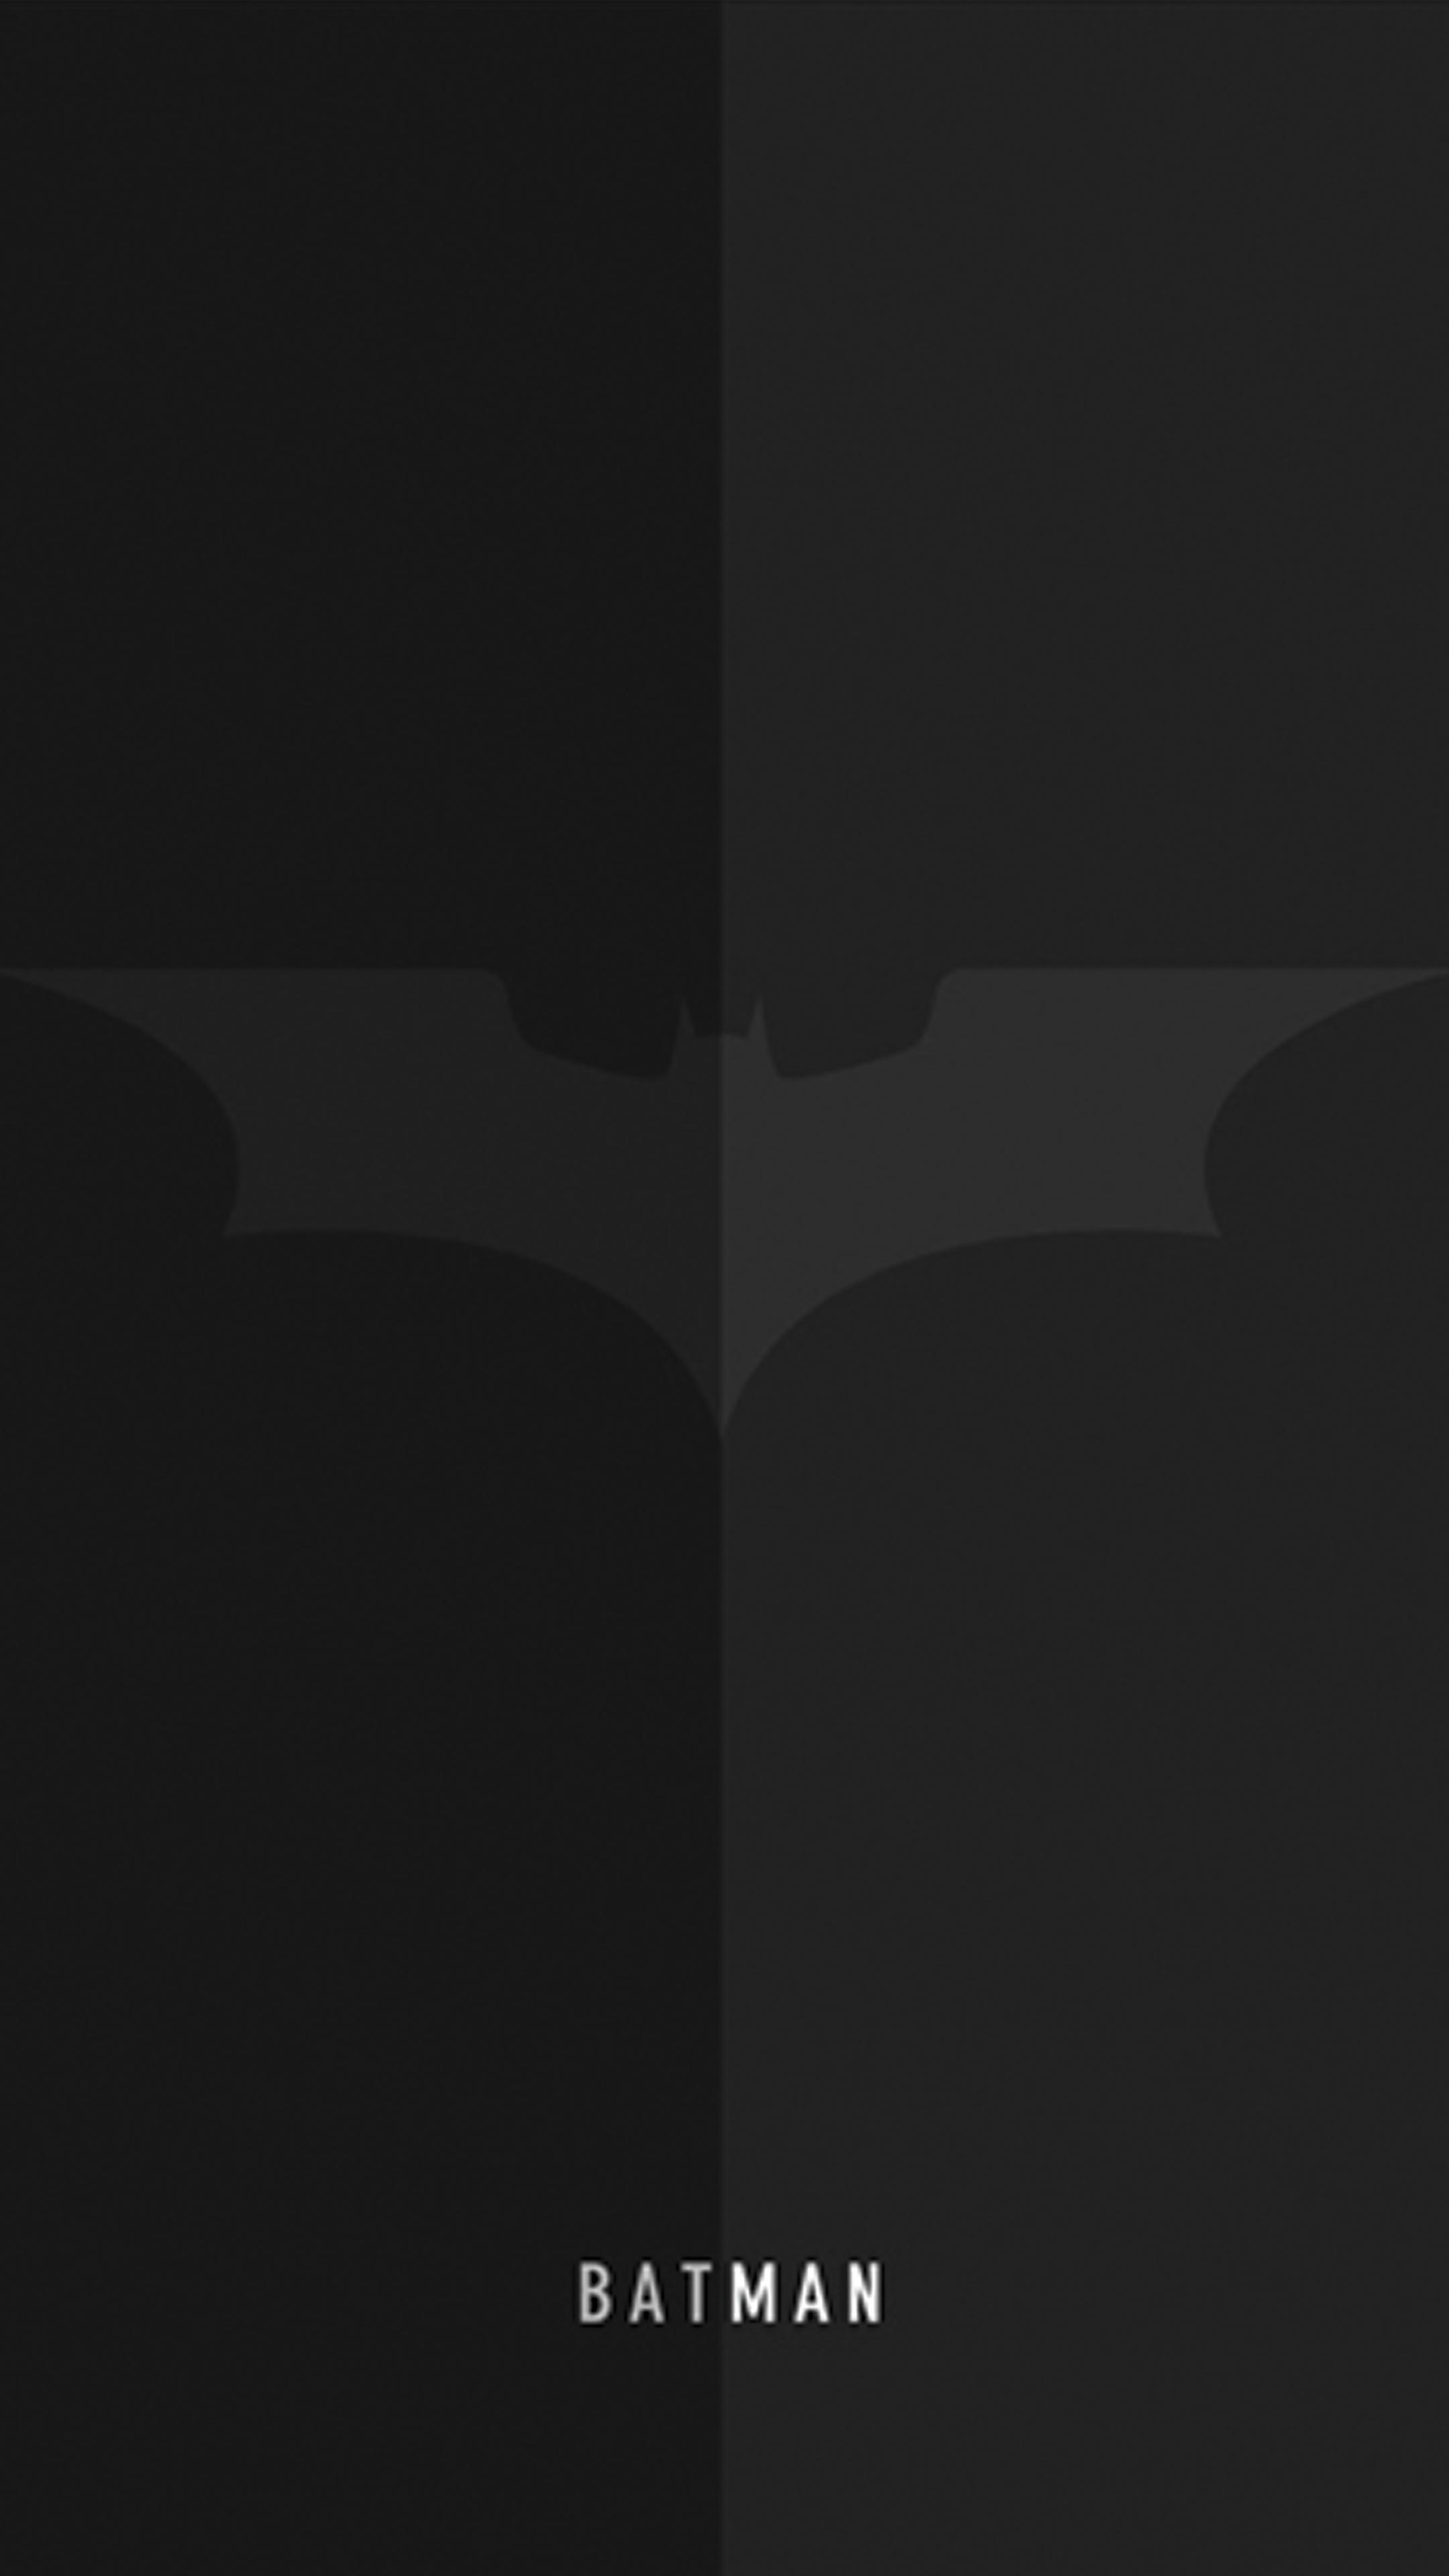 Batman Mobile Wallpaper Miniwallist